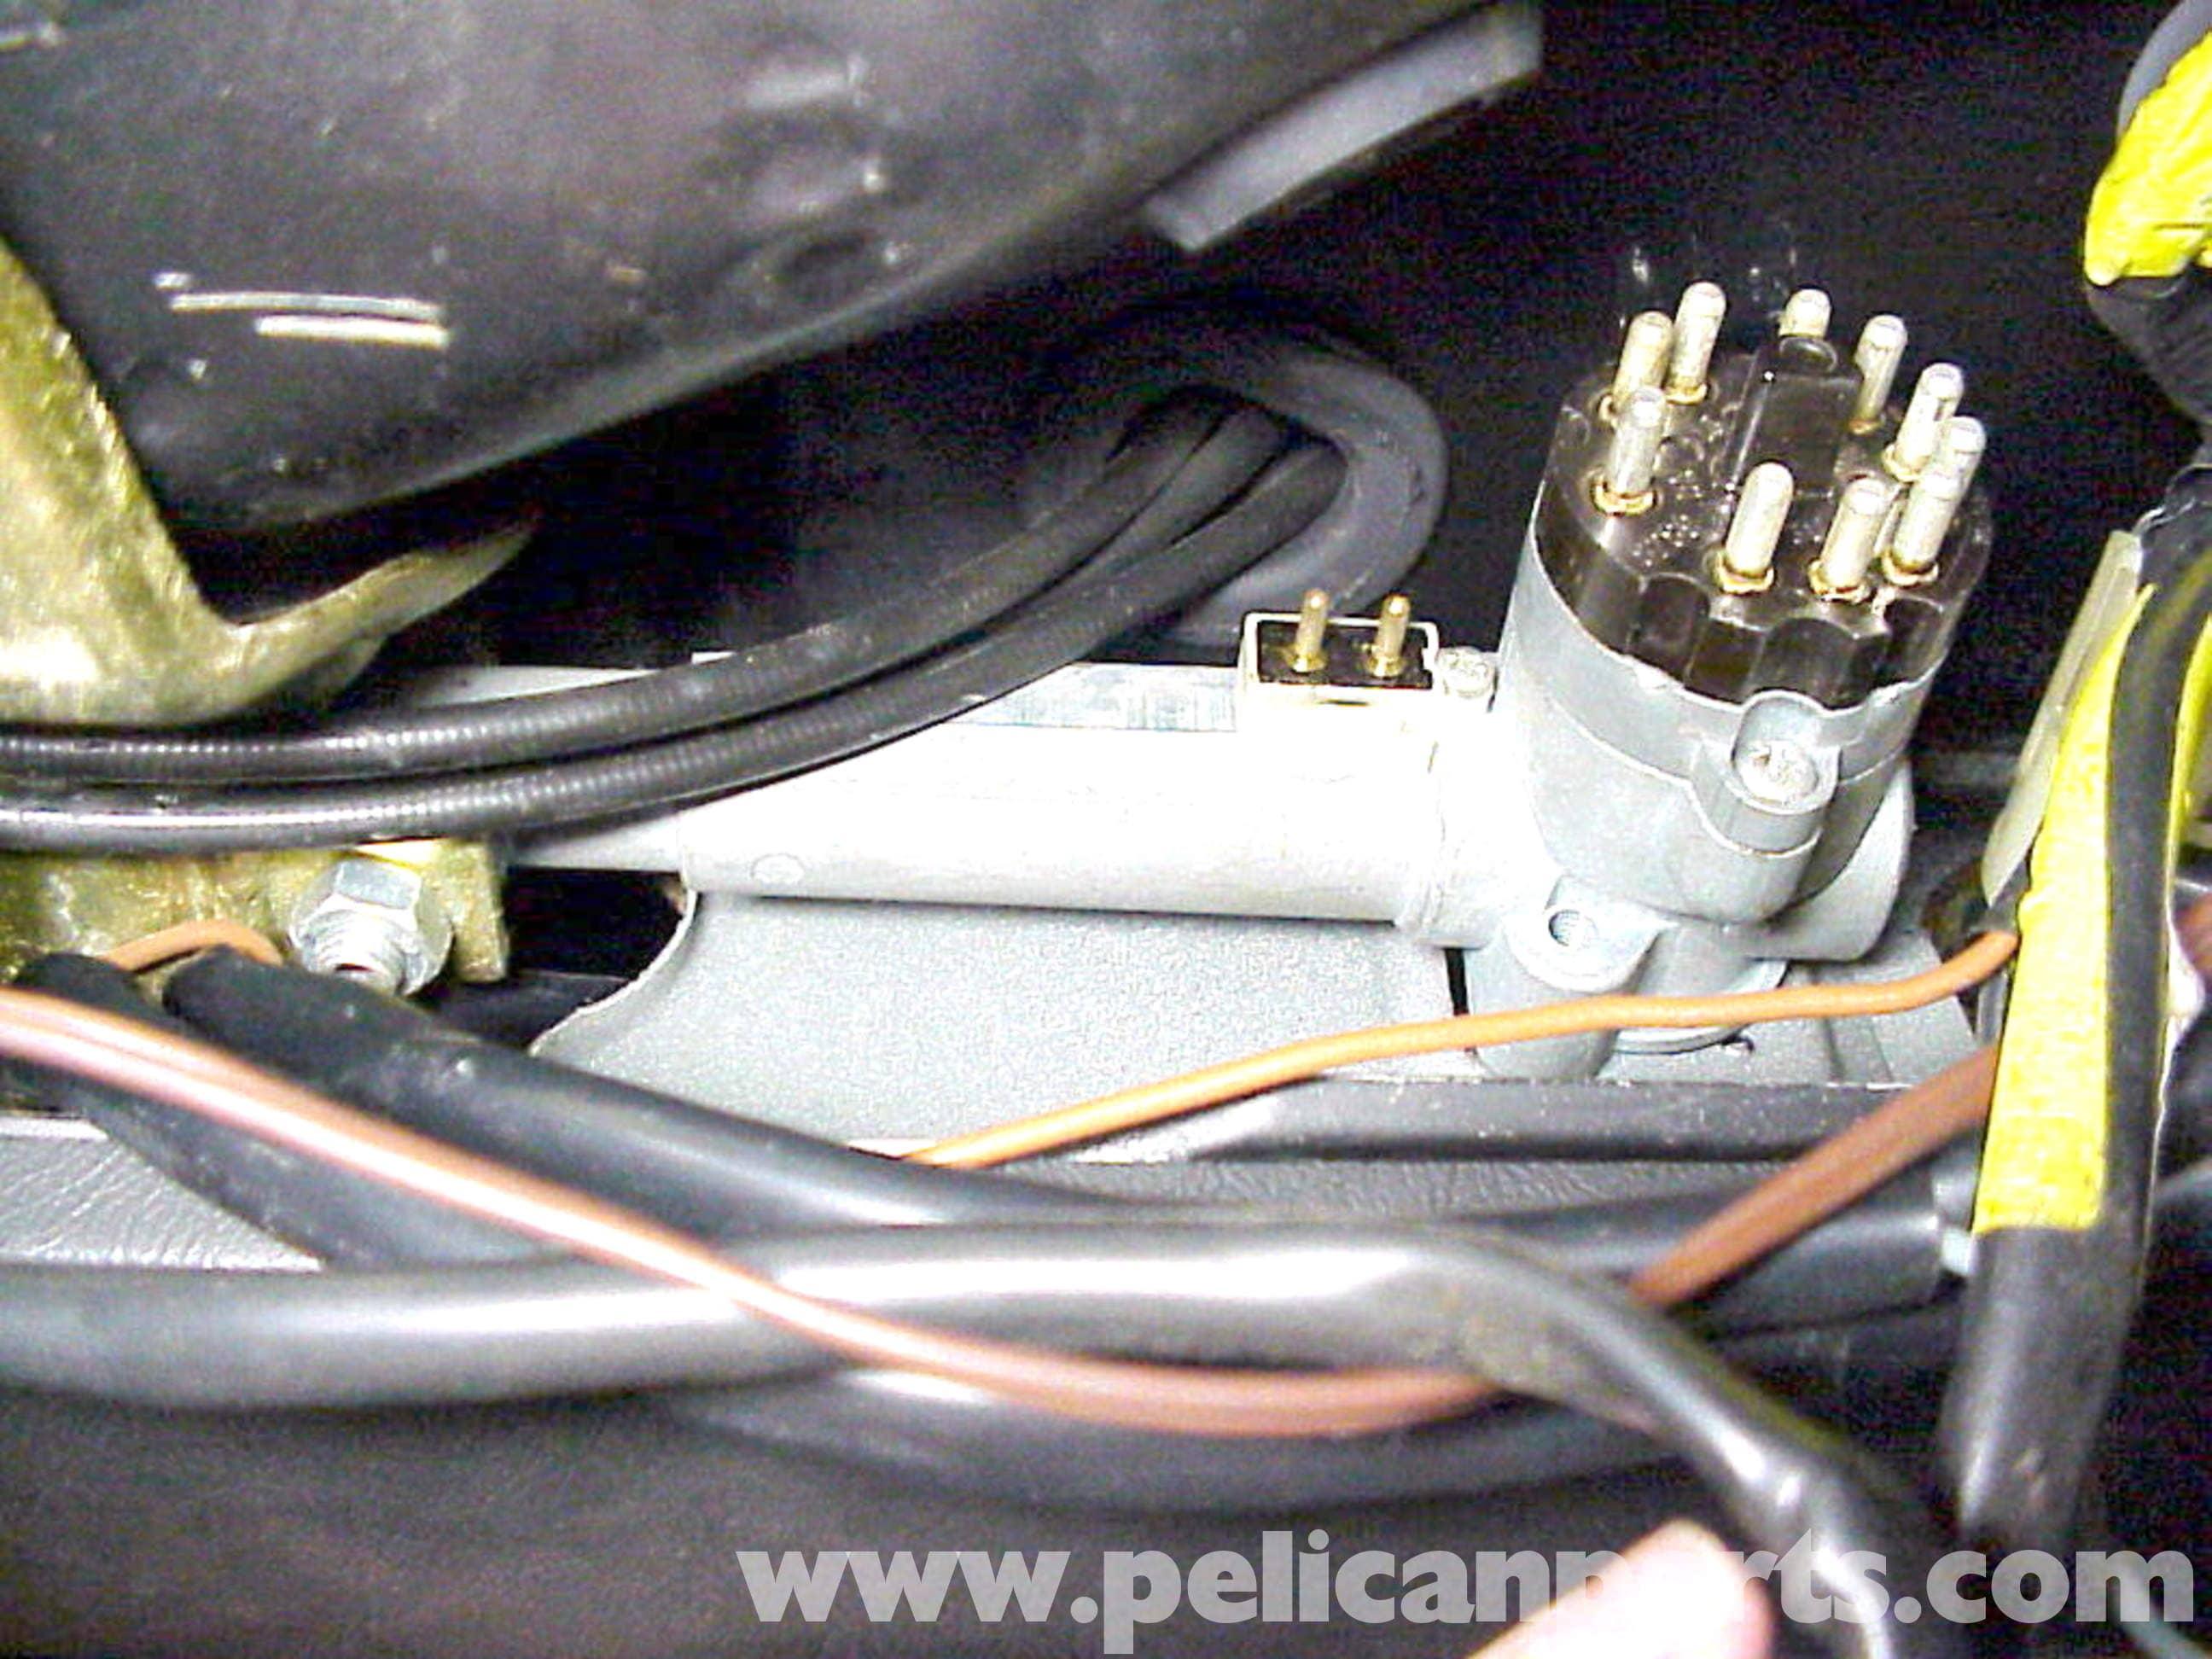 1966 corvette ignition wiring diagram 3 position switch porsche 911 replacement | (1965-89) - 930 turbo (1975-89) pelican parts ...